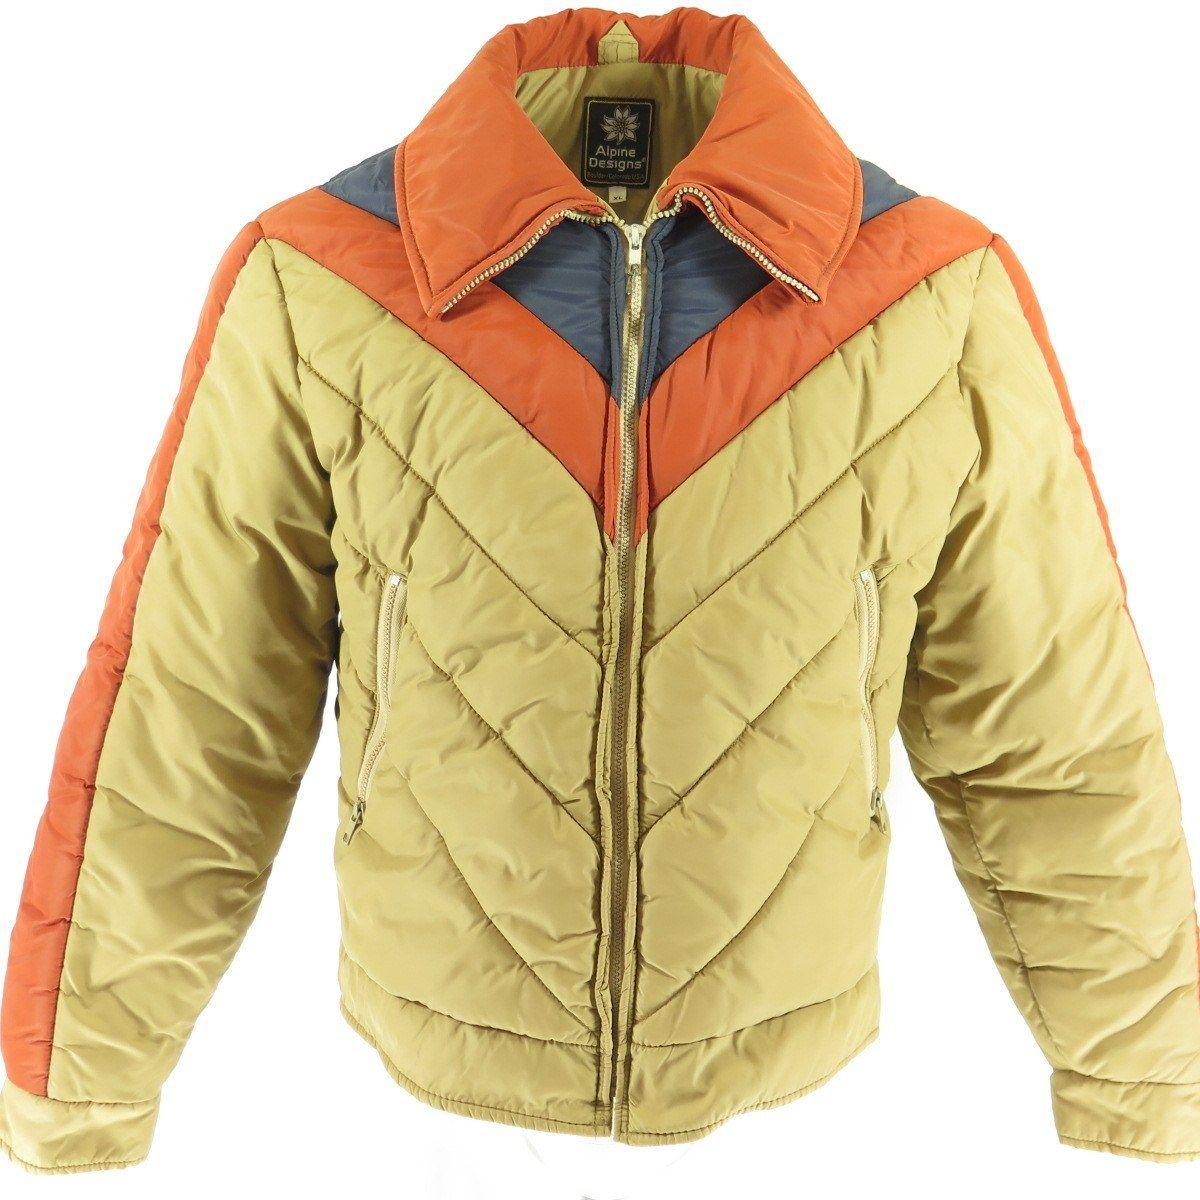 db2c3fe200 Vtg 80s Alpine Designs Puffy Puffer Ski Winter Jacket Mens Retro XL ...